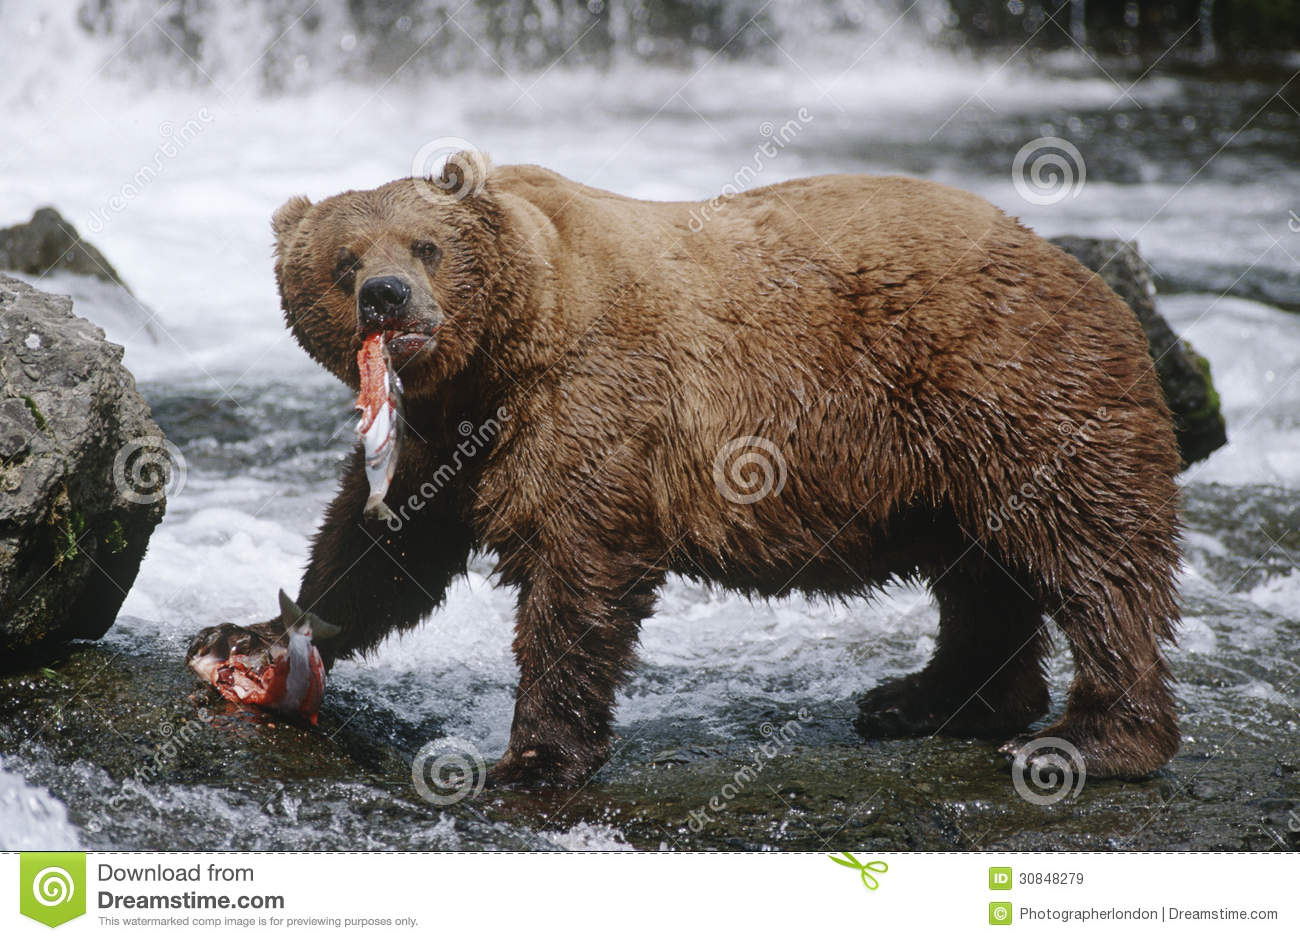 USA Alaska Katmai National Park Brown Bears Eating Salmon River.